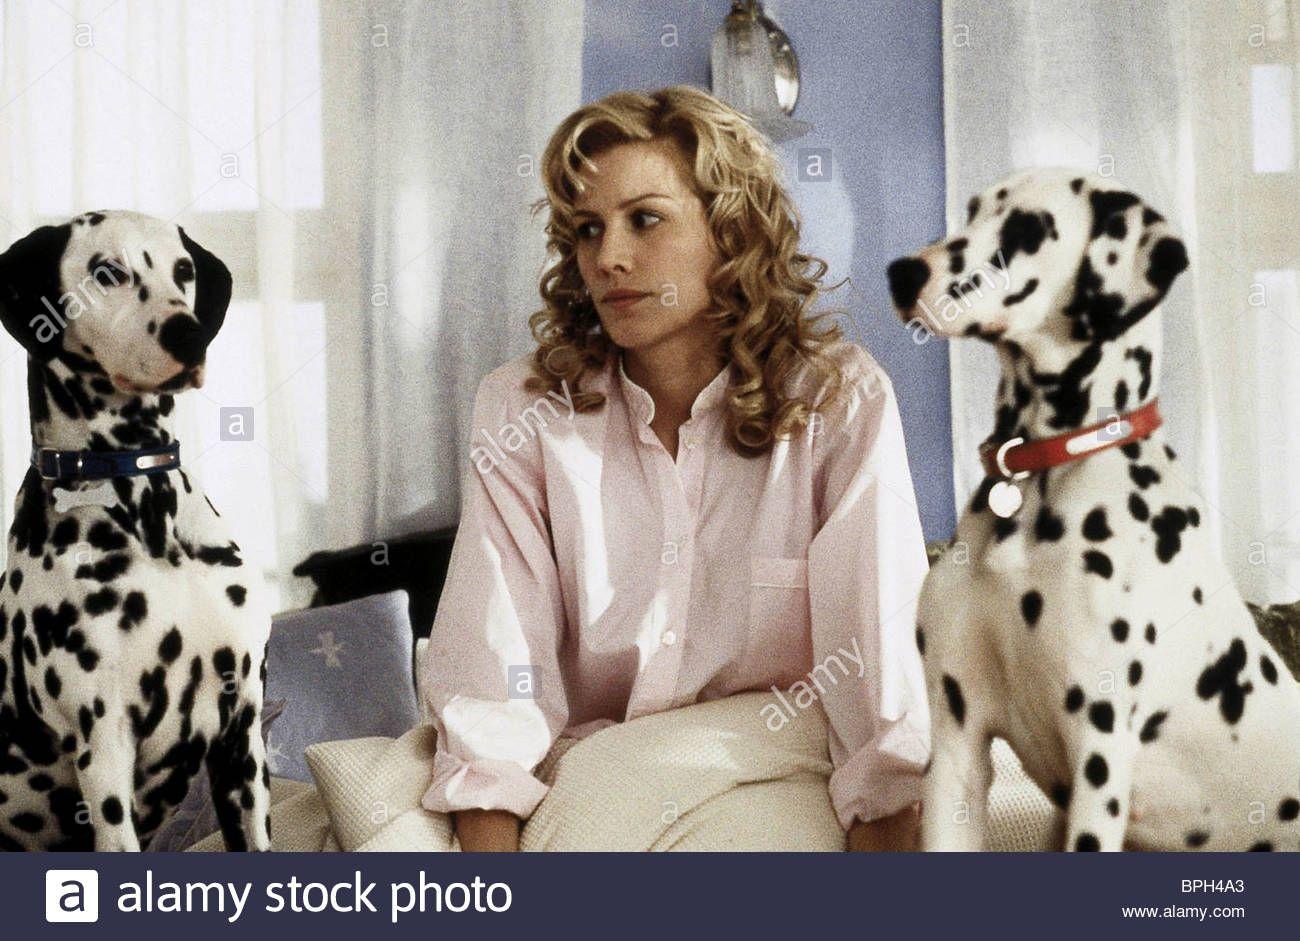 Alice Evans Dalmations 102 Dalmatians 2000 Stock Image Dalmatian Disney Live Action Movies Disney 101 Dalmatians